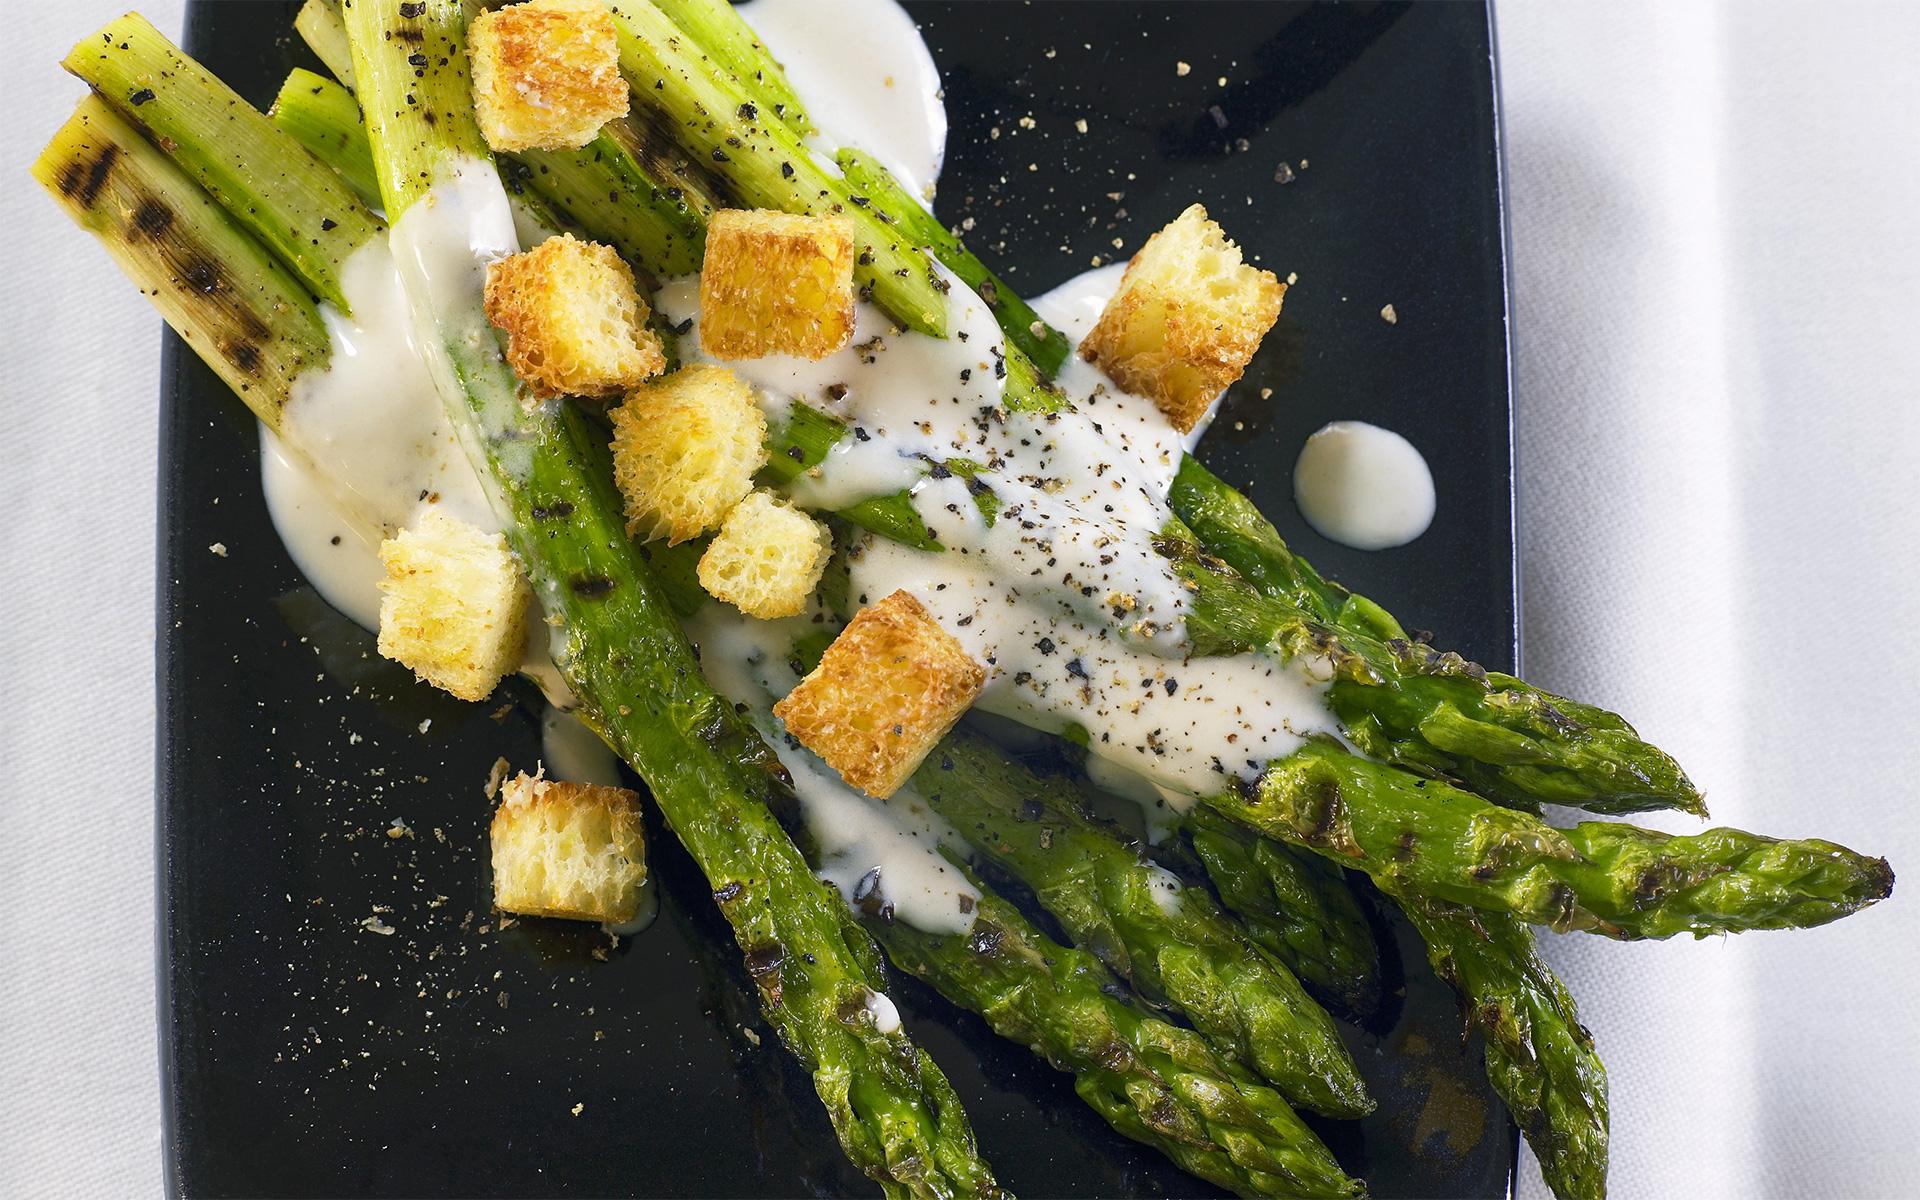 Gegrillter grüner Spargel mit Cesar-Salad-Dressing